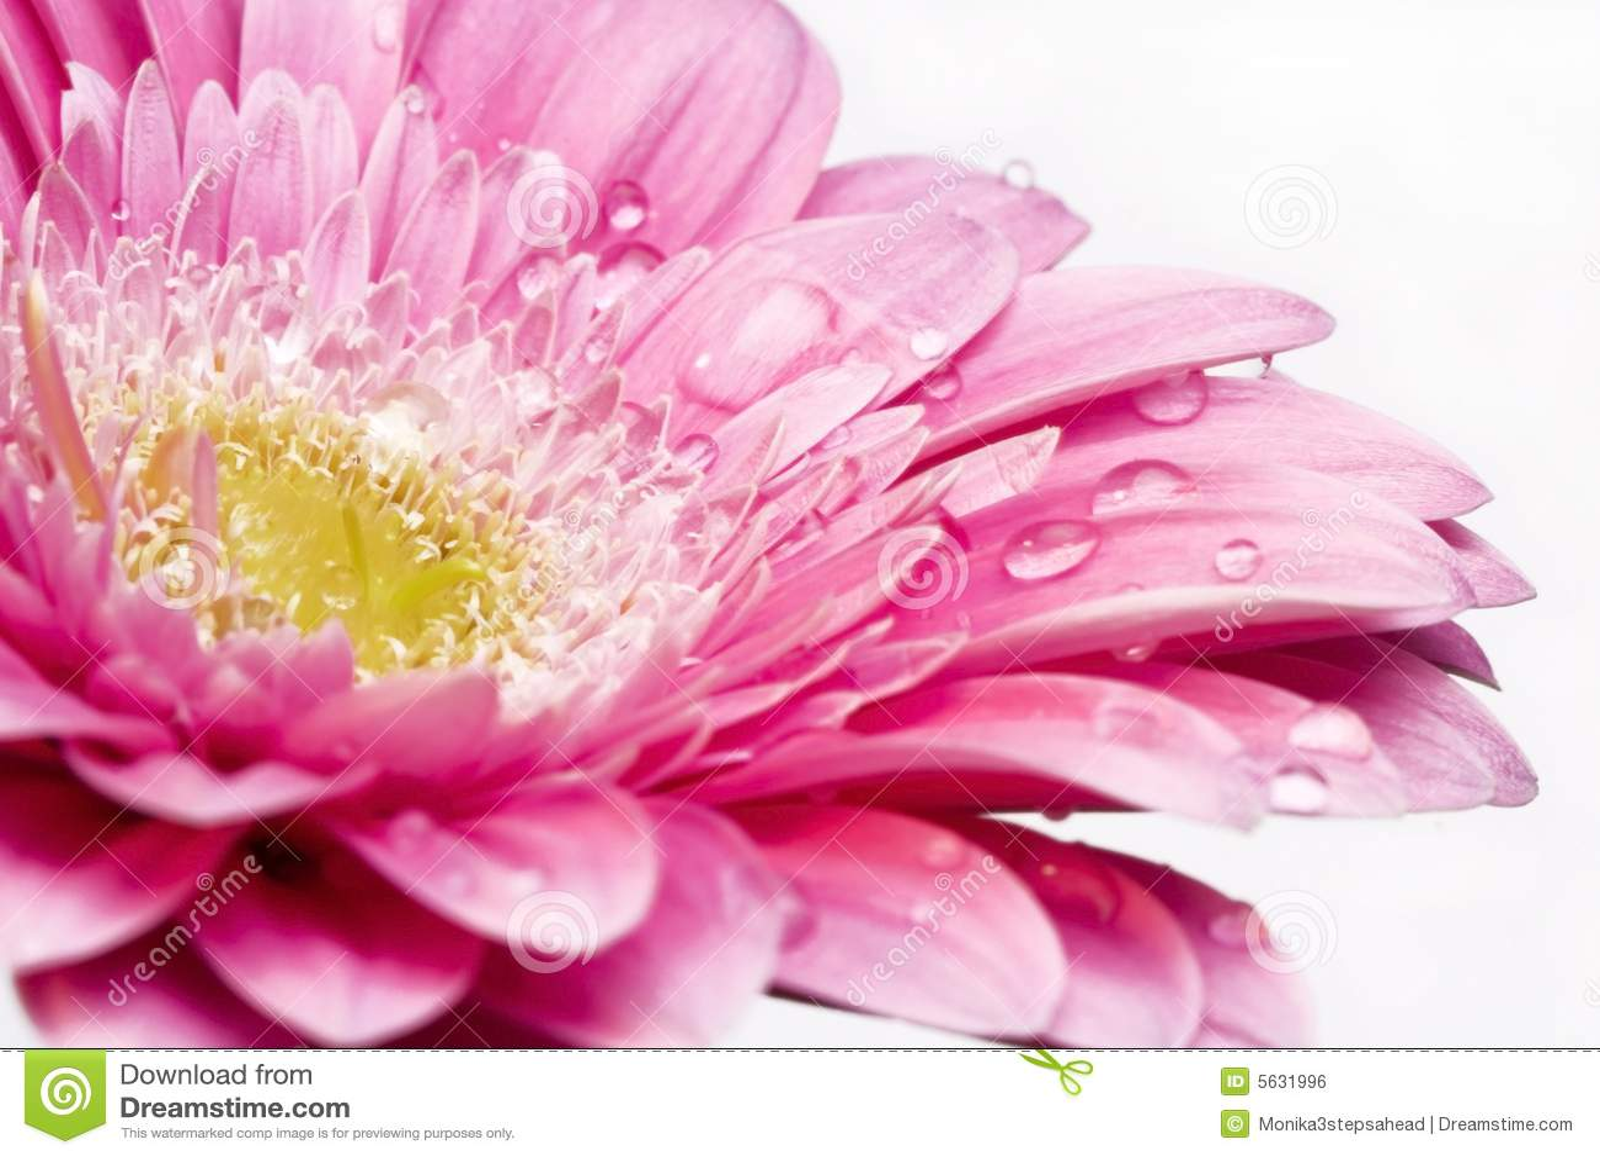 Pink Gerber Daisy Clip Art Pink gerber daisy with